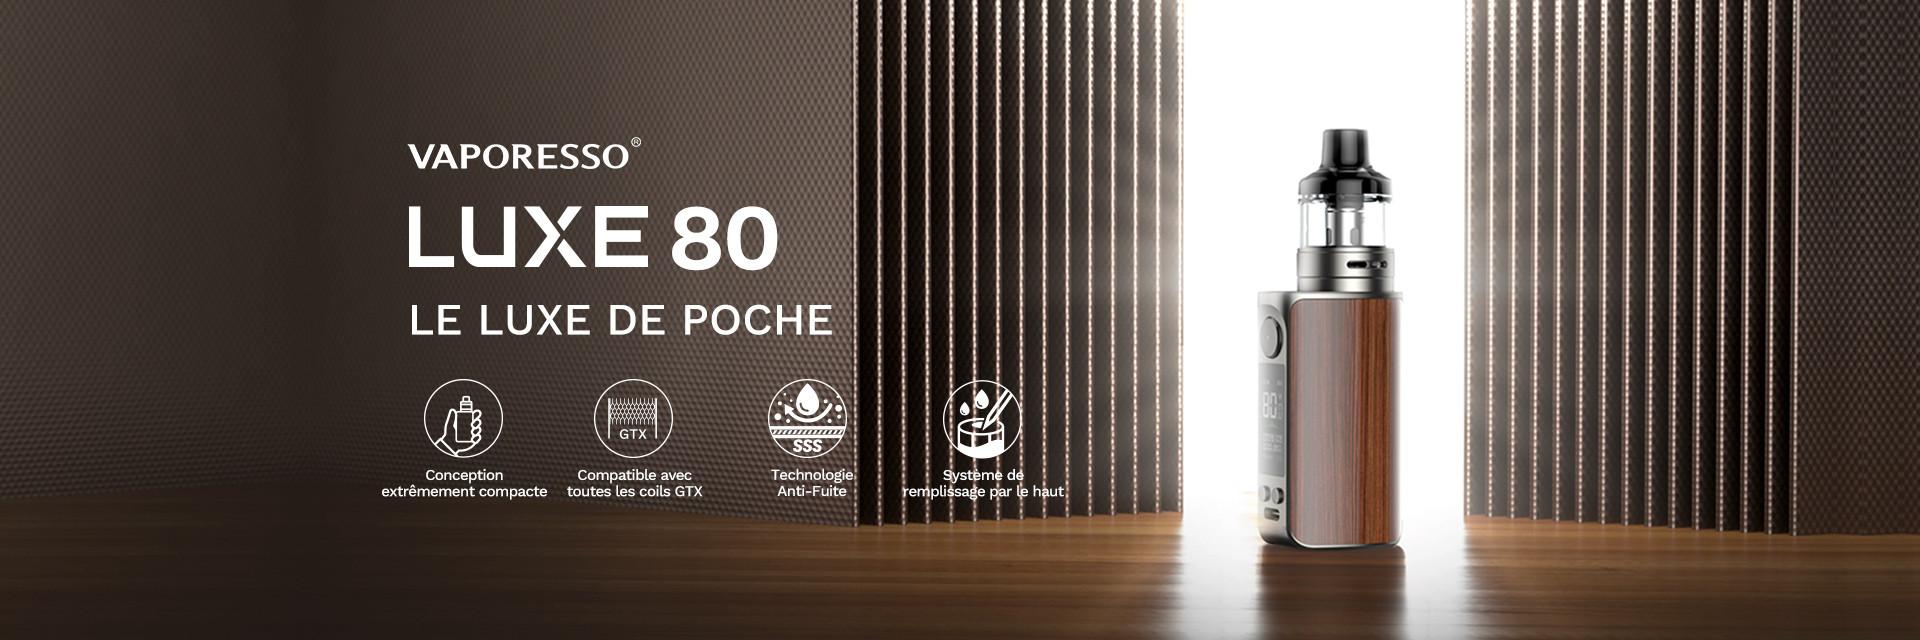 Vaporesso - kit luxe 80 / 80SE by vaporesso - lca distribution